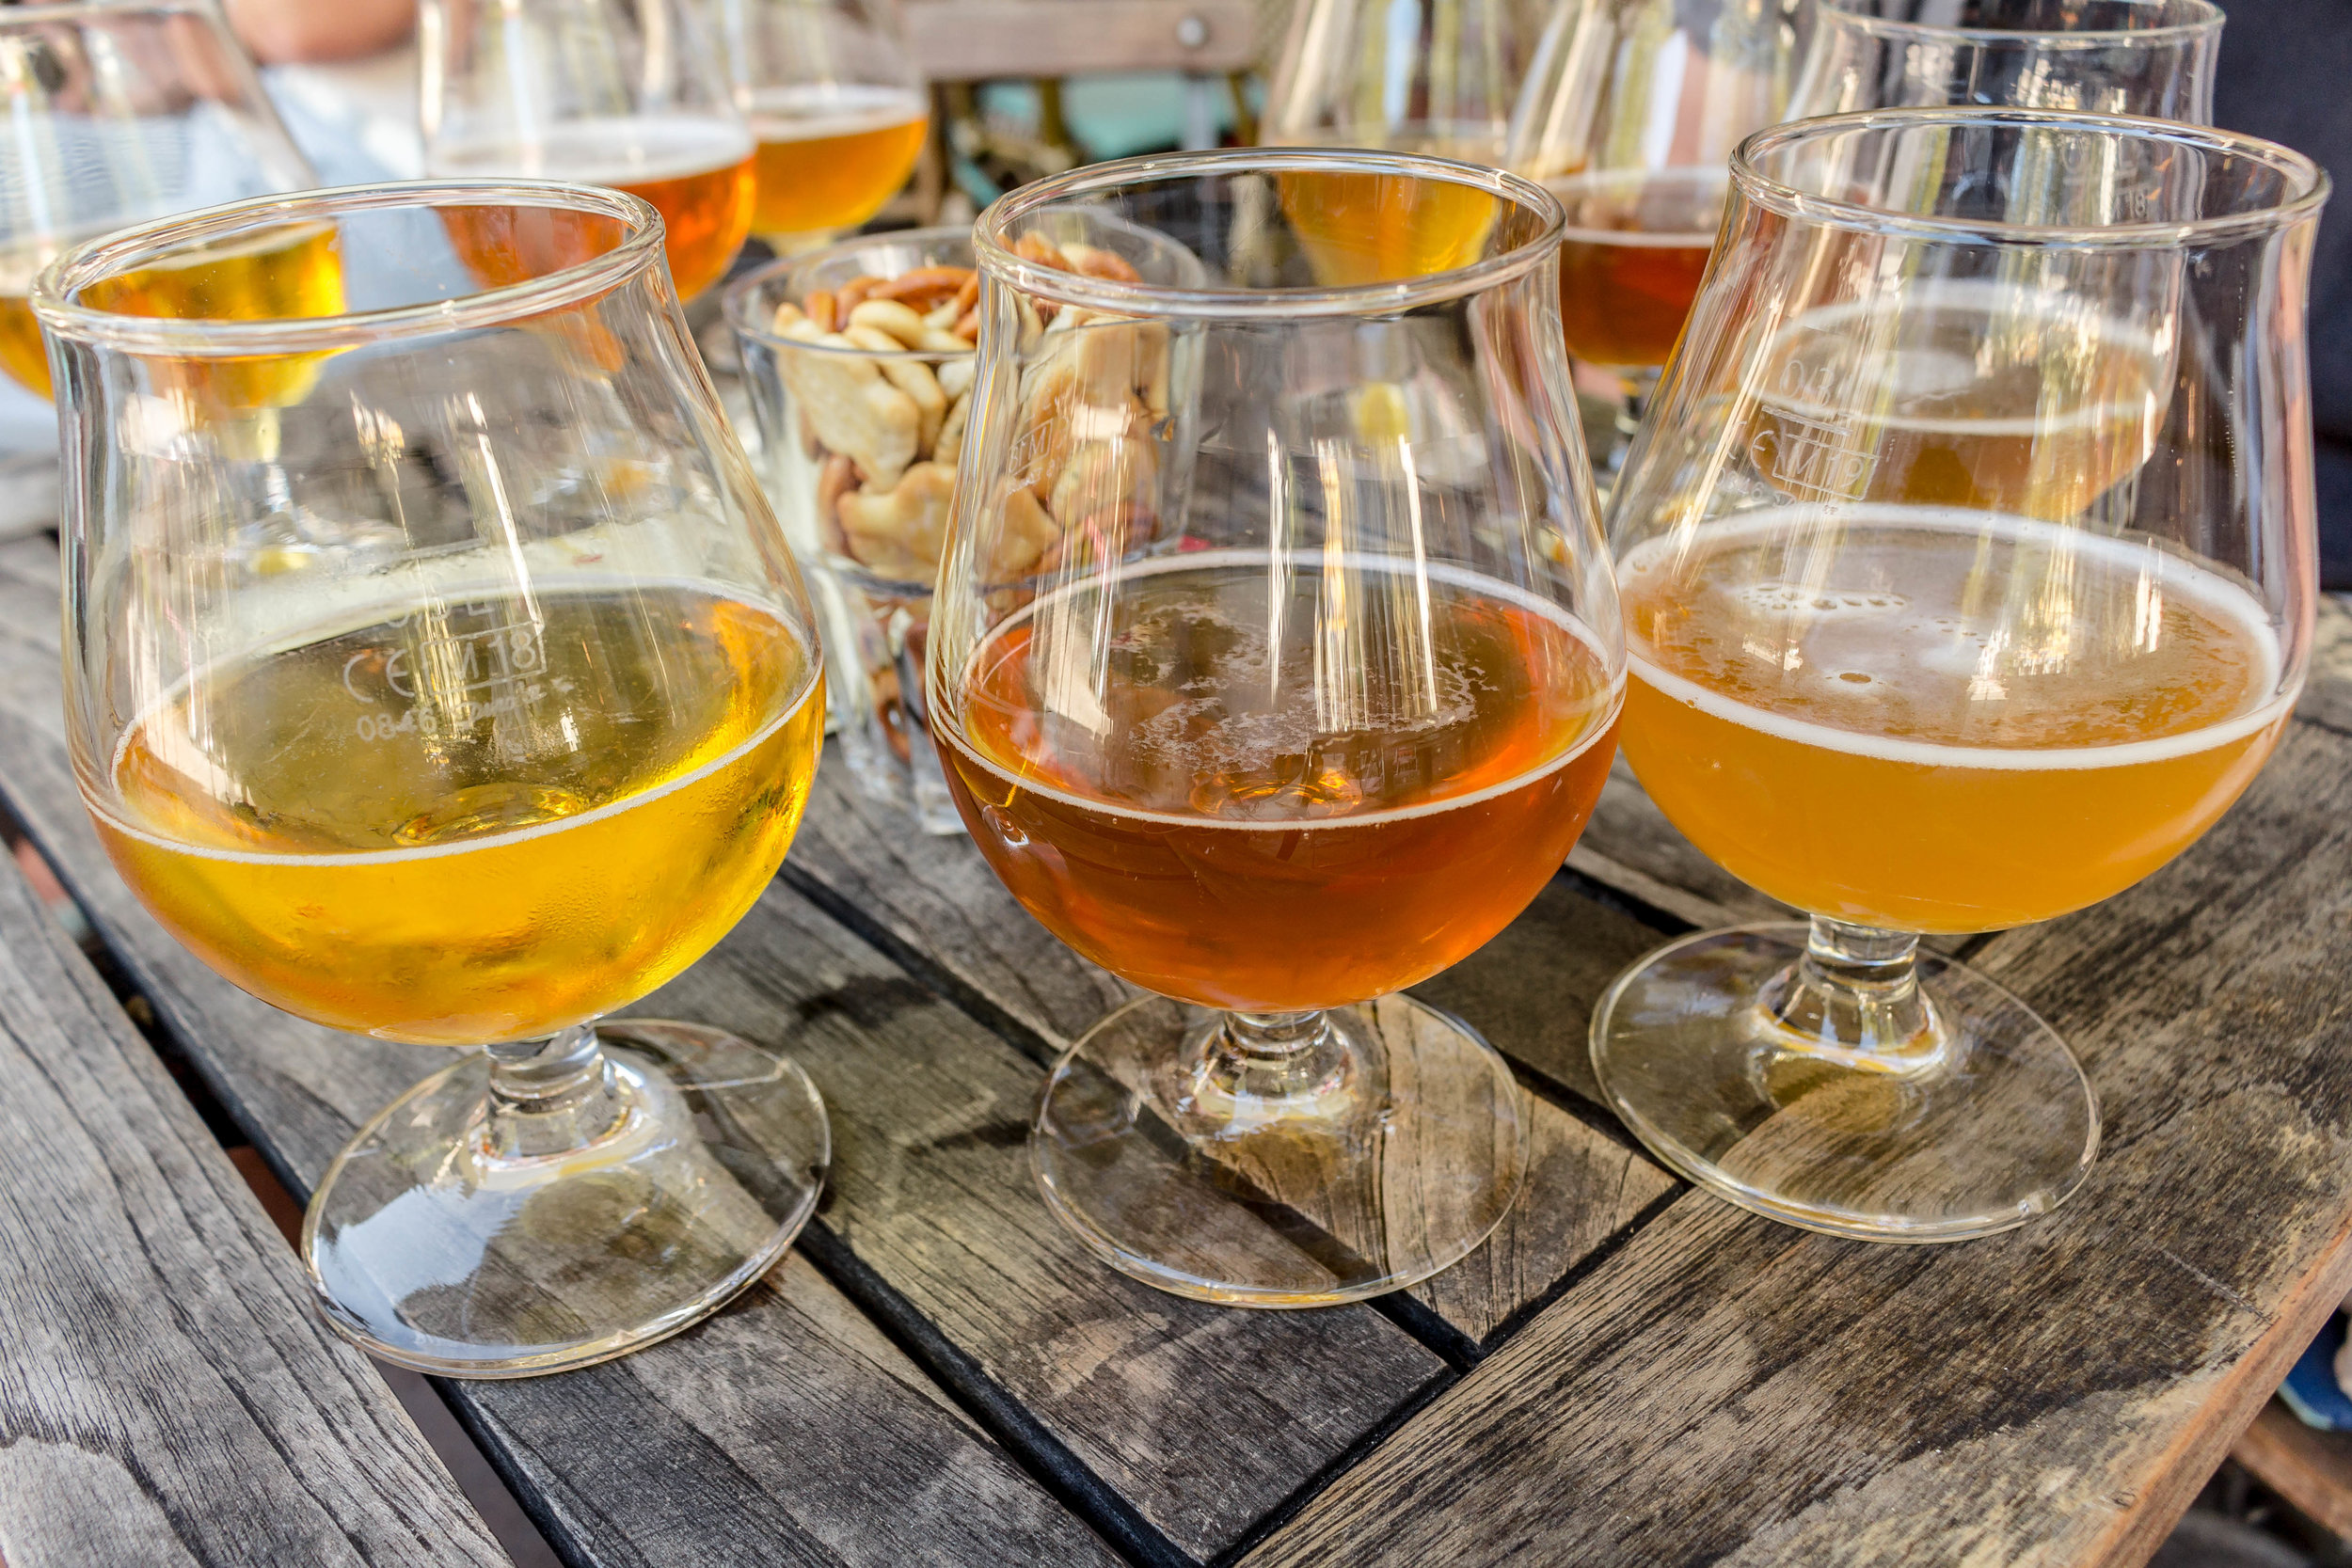 Lju-beer-ljana: a locally-led craft beer tour of Ljubljana, Slovenia